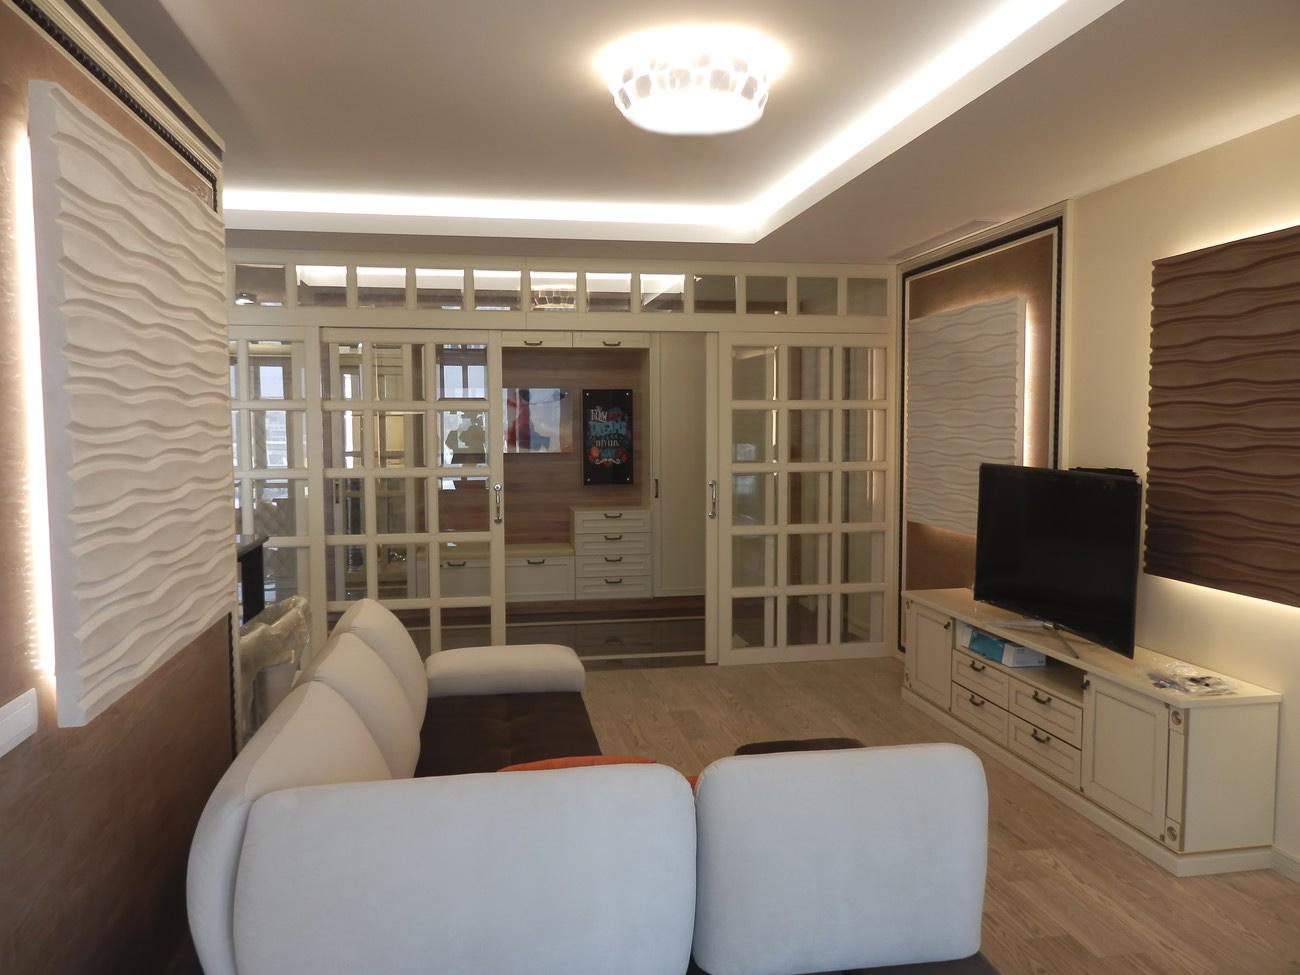 симпатичная гостиная в ЖК chelsea tower